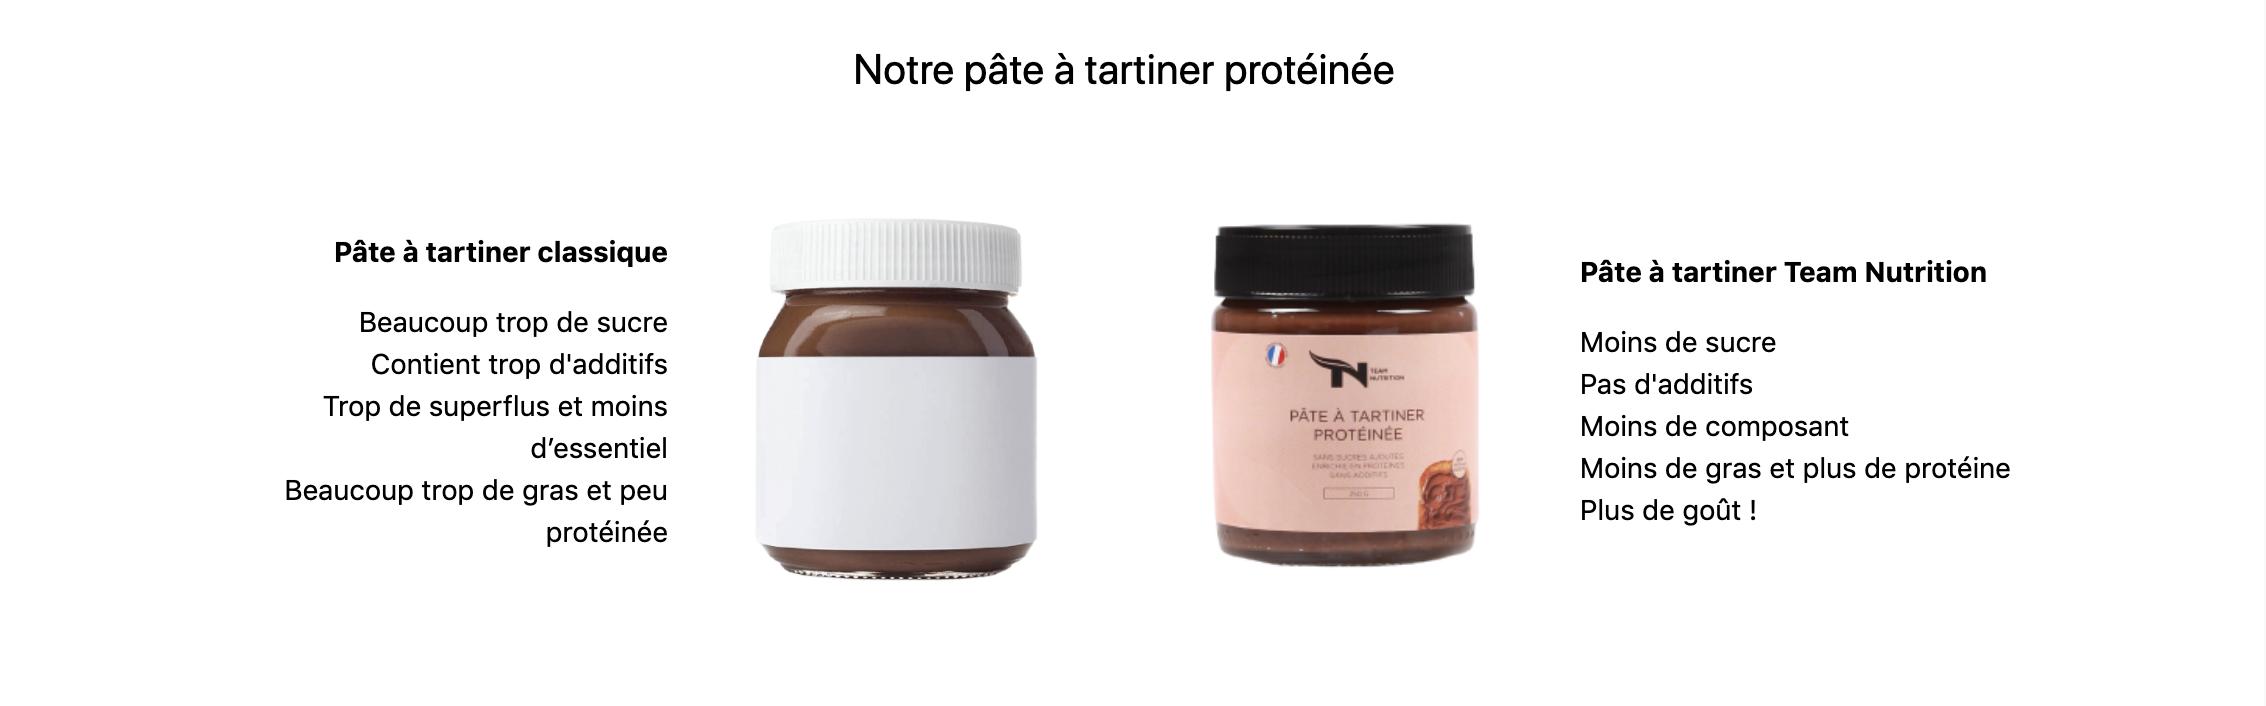 Pâte à tartiner protéinée